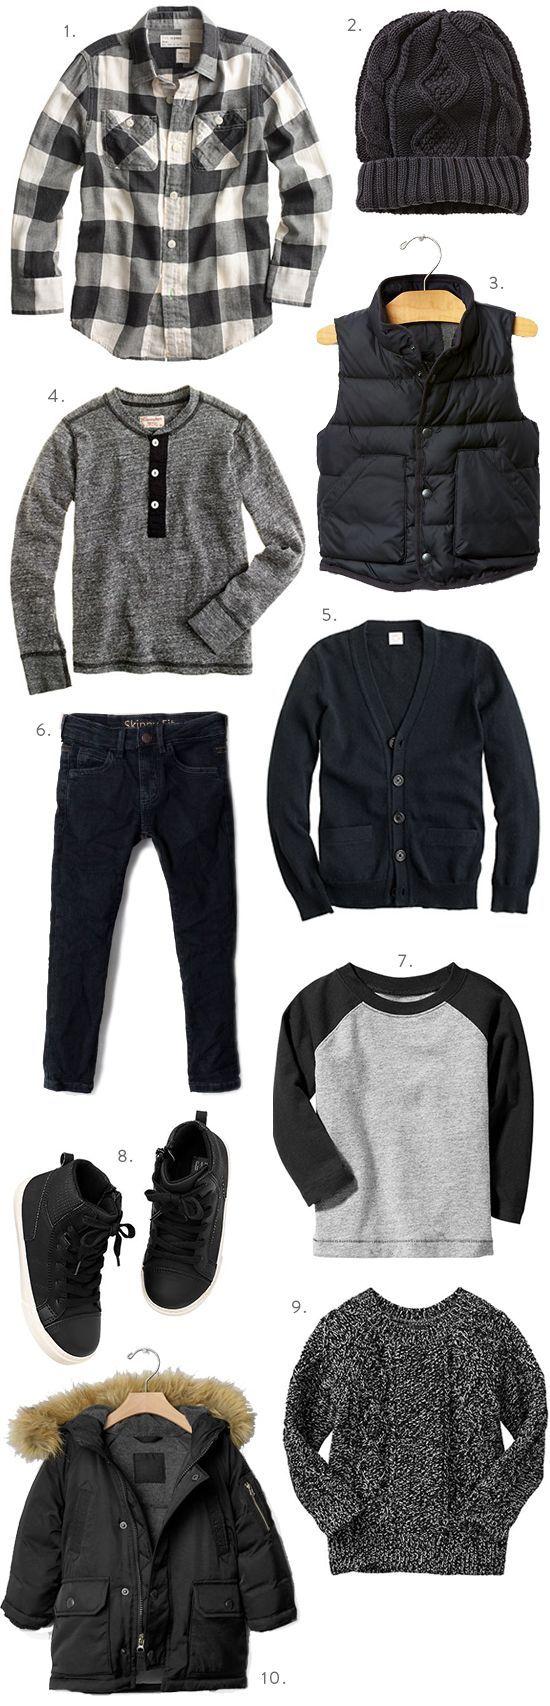 Boys Fall Fashion at J. Crew Black is Back is EVERYYYYYTHING! Baby ElJay inspiration